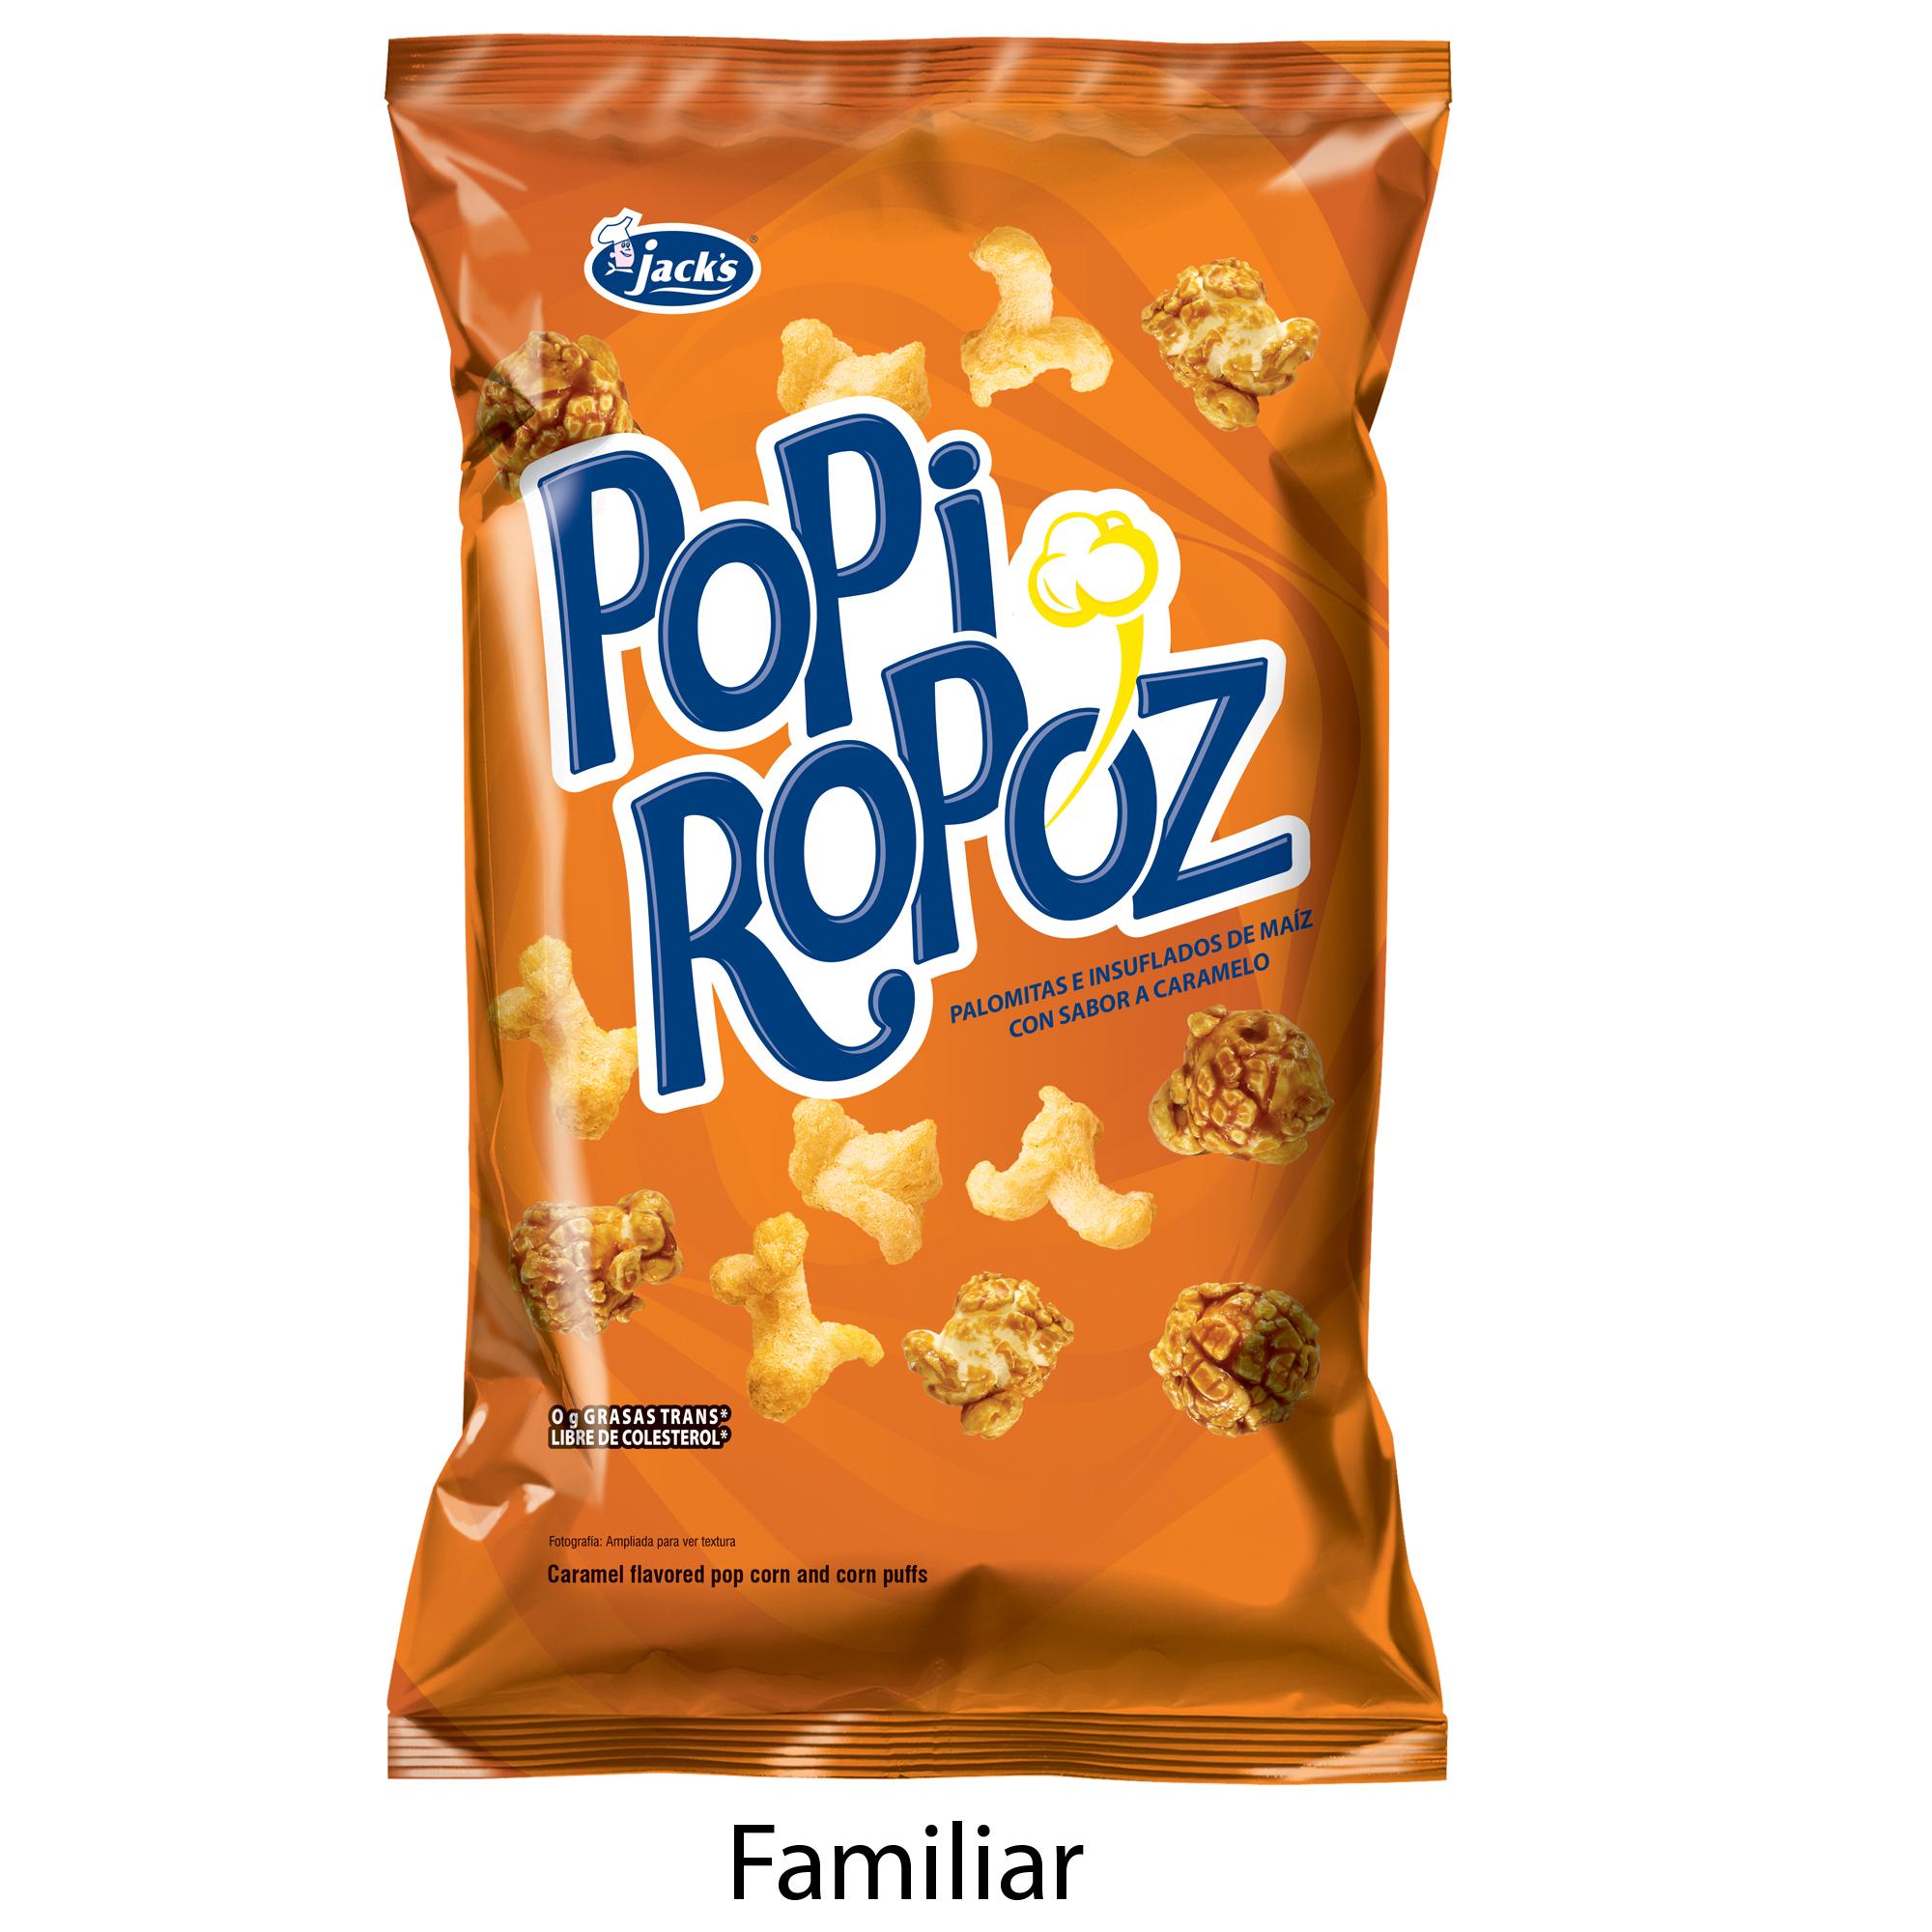 POPIROPOZ presentac pag web